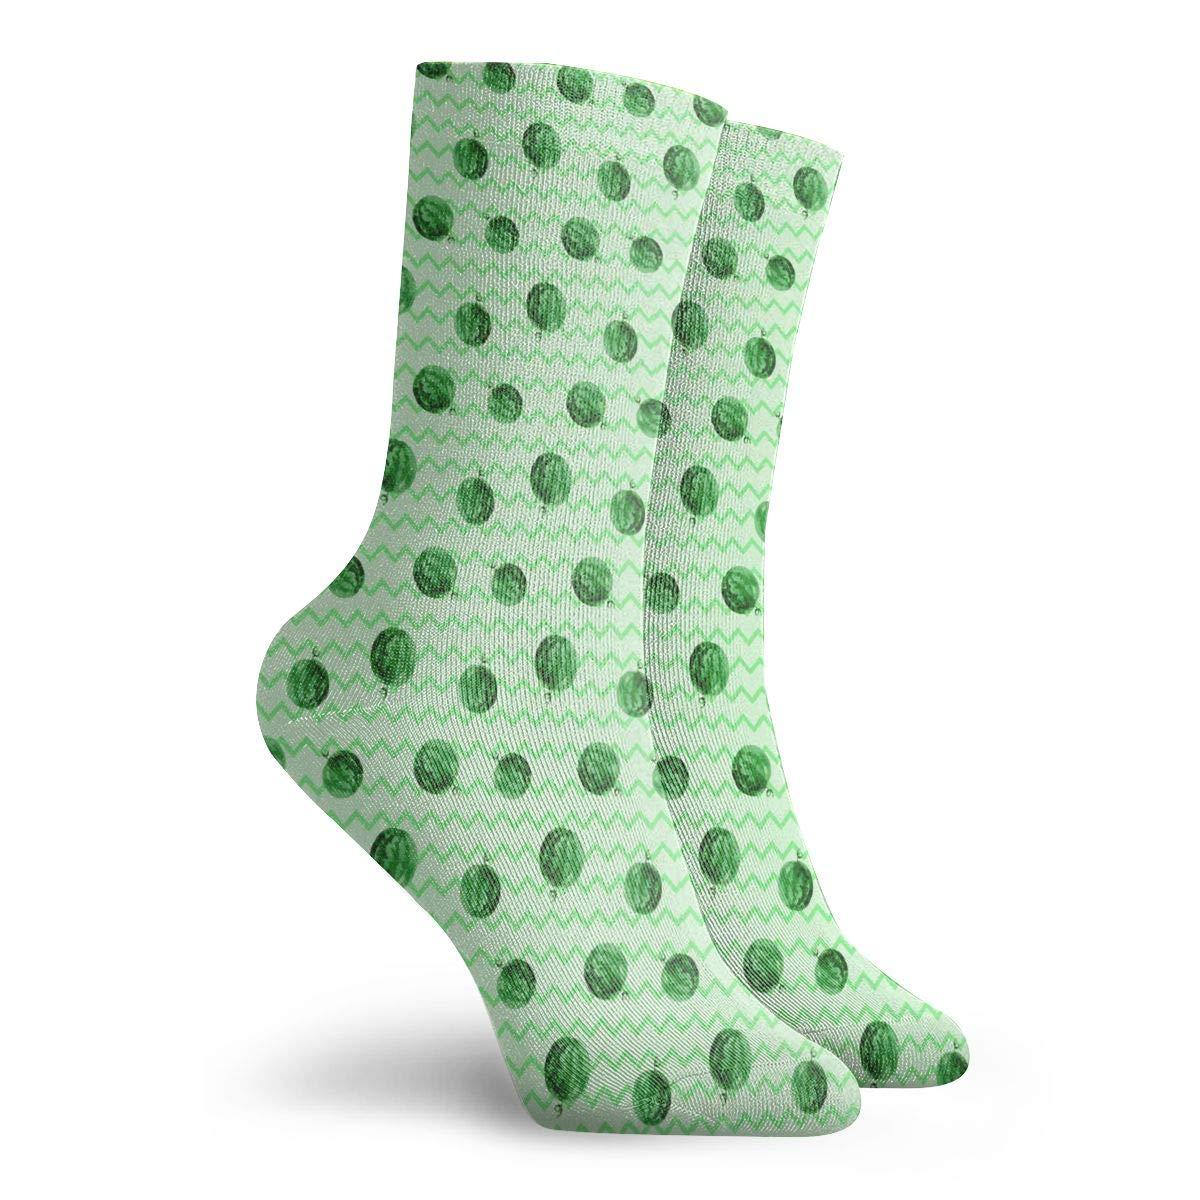 Green Funny Watermelon Unisex Funny Casual Crew Socks Athletic Socks For Boys Girls Kids Teenagers